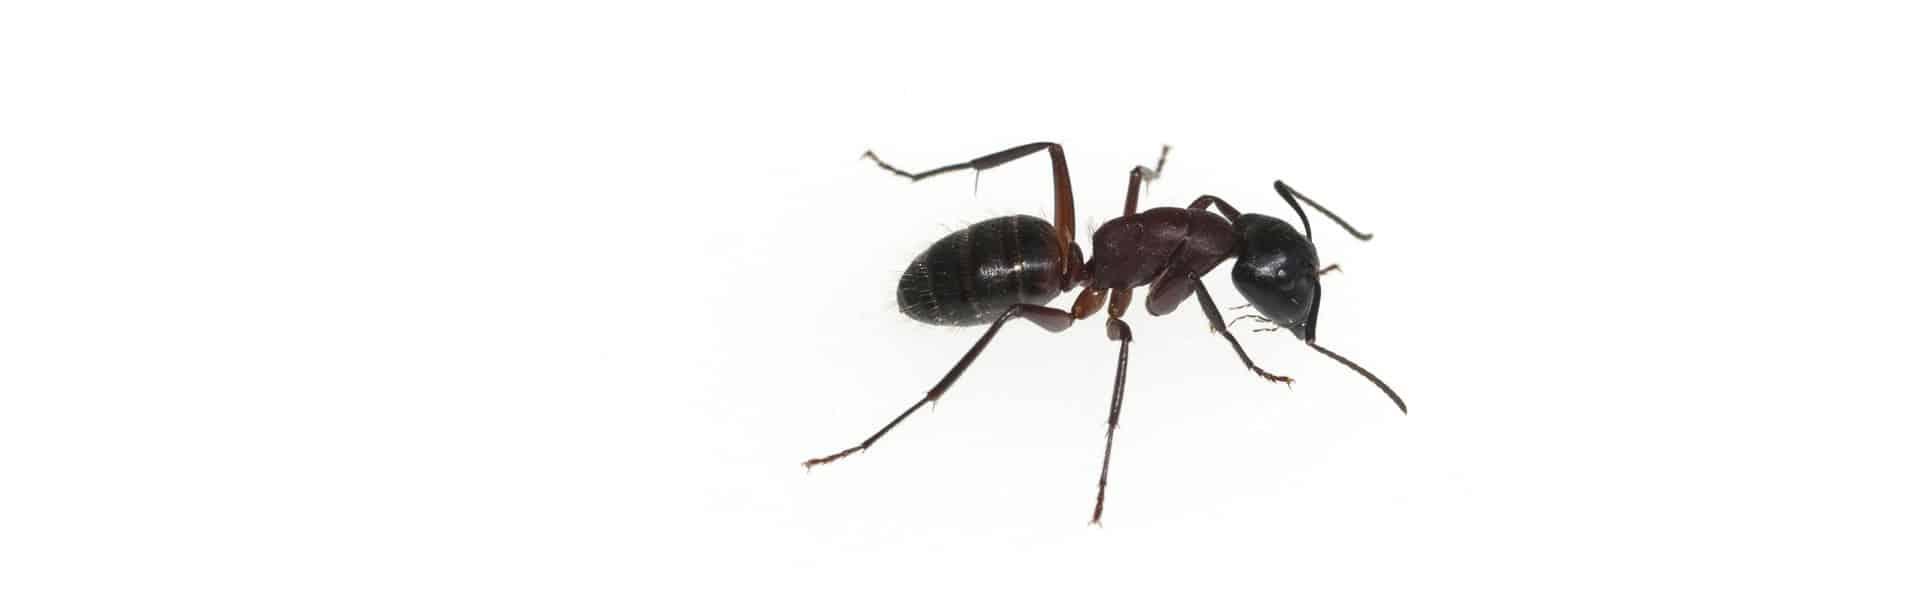 Carpenter ant removal Toronto